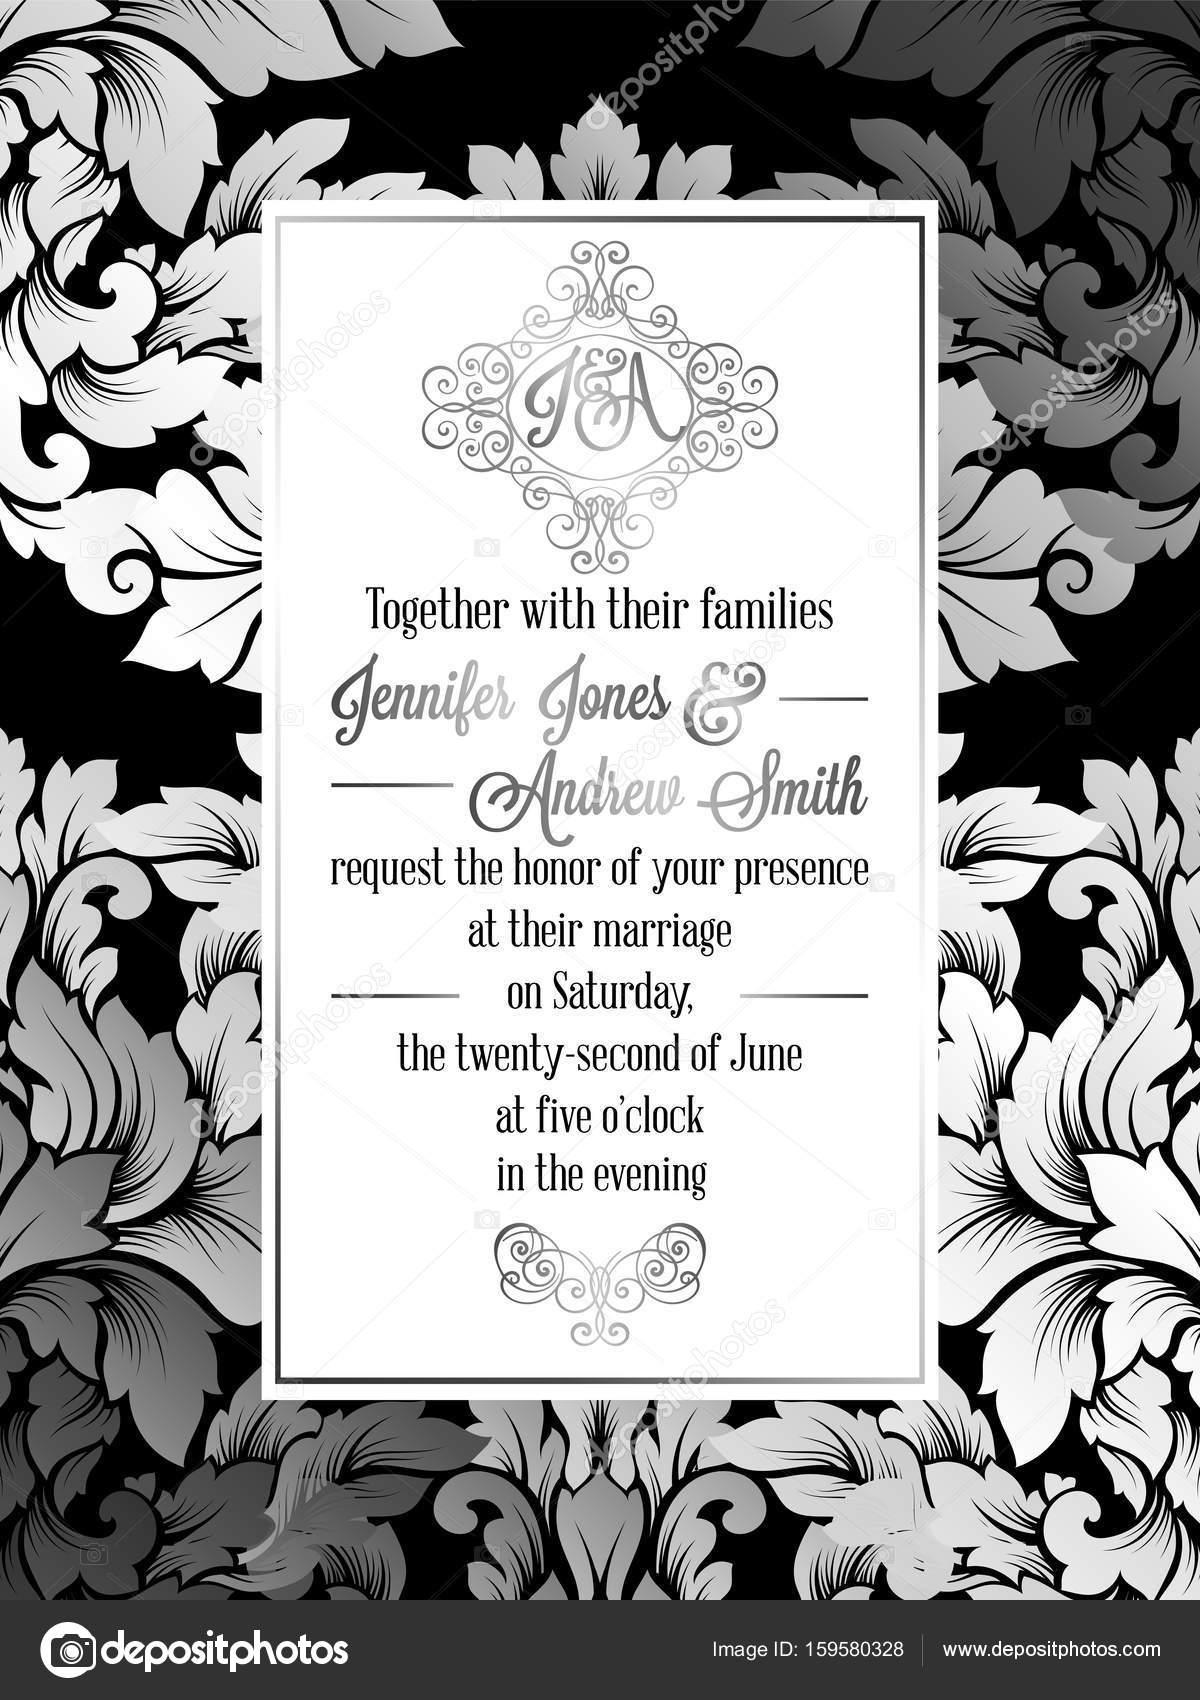 vintage baroque style wedding invitation card template.. elegant